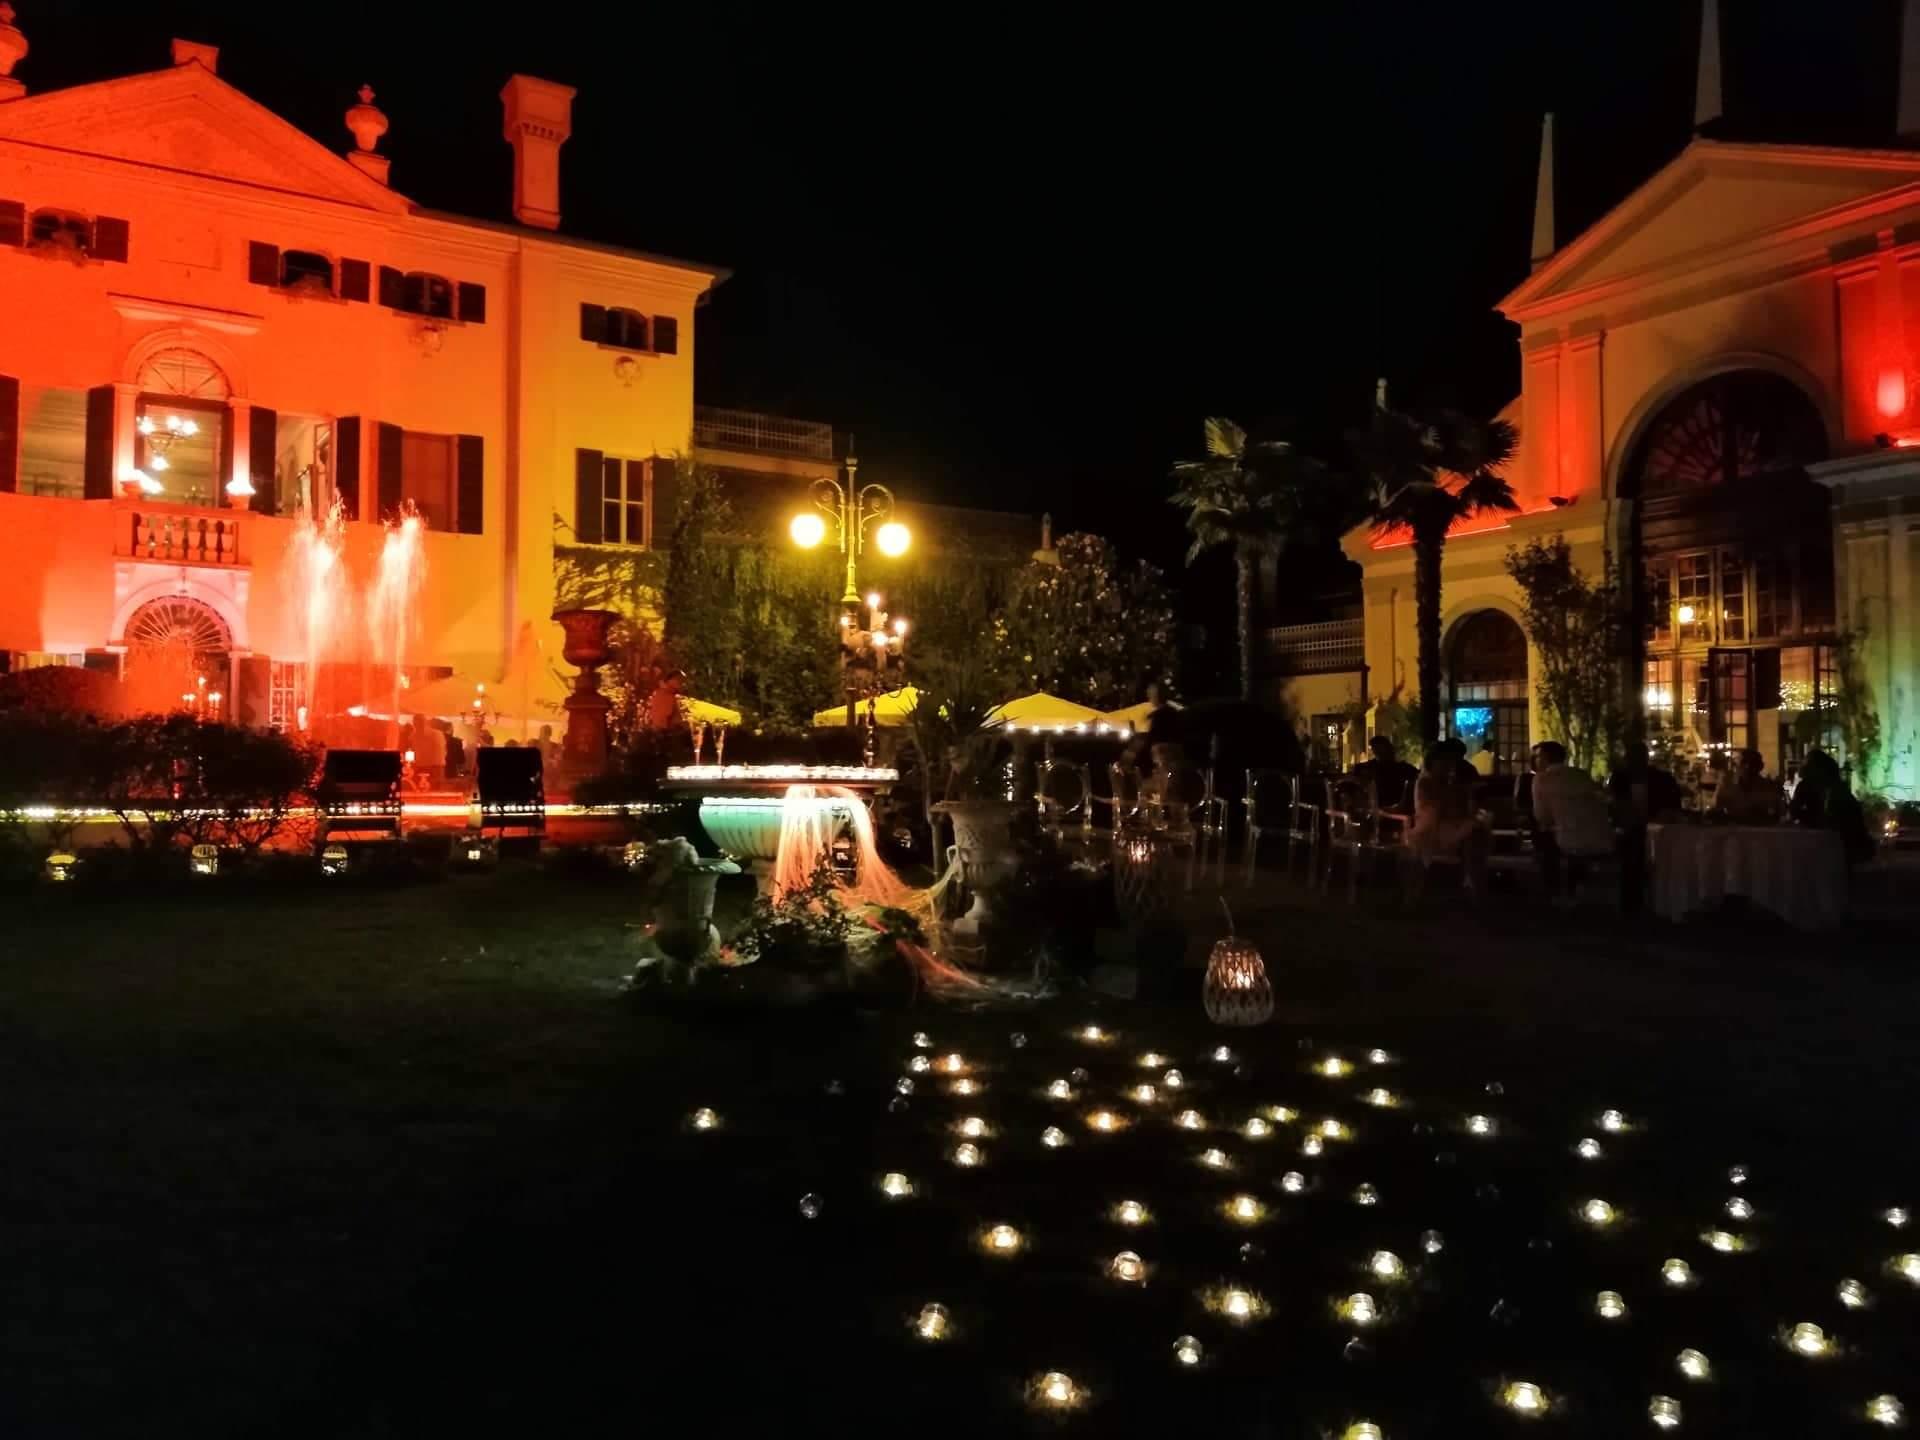 MATRIMONI DI LUSSO - WEDDINGS LUXURY